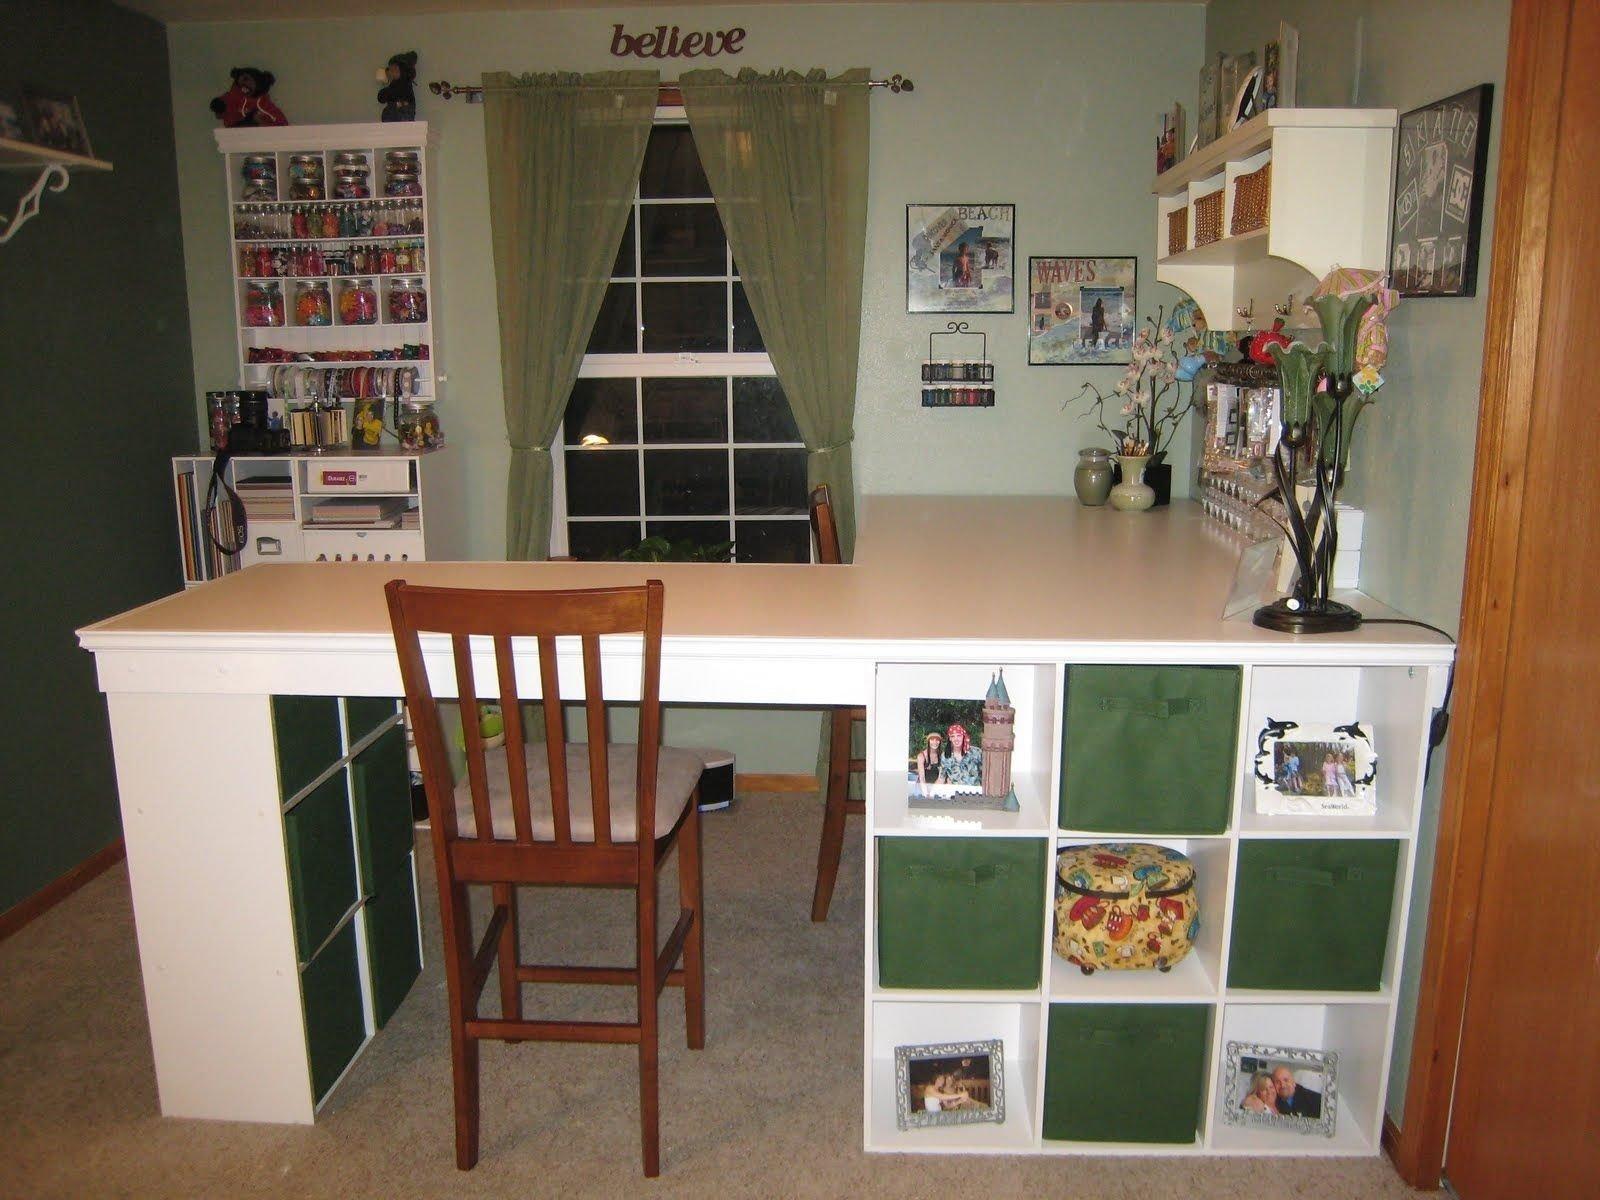 10 Elegant Do It Yourself Storage Ideas do it yourself white craft desk how to build a custom craft desk 2021